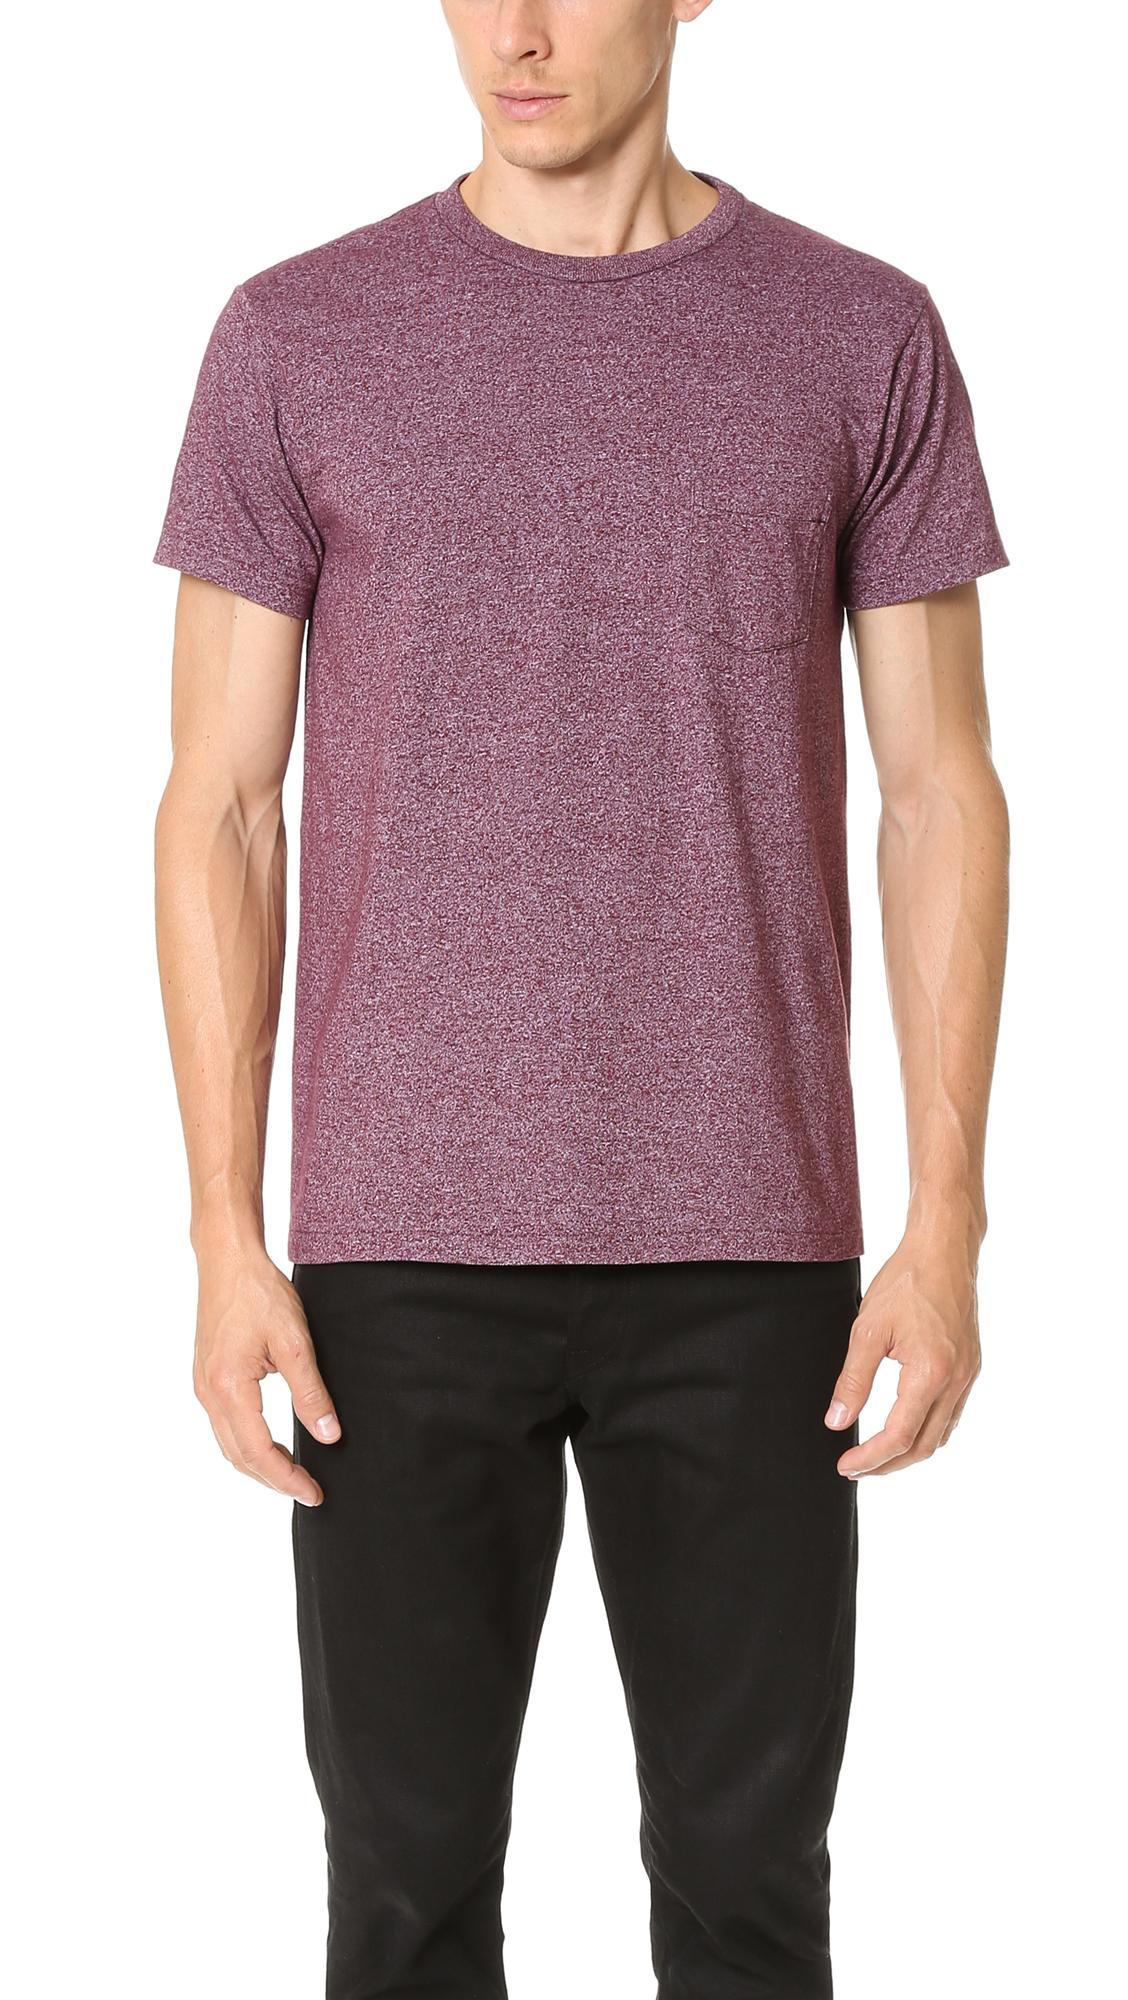 Velva Sheen Mock Twist Crewneck Pocket T-shirt - Xl - Also In: M, S In Burgundy